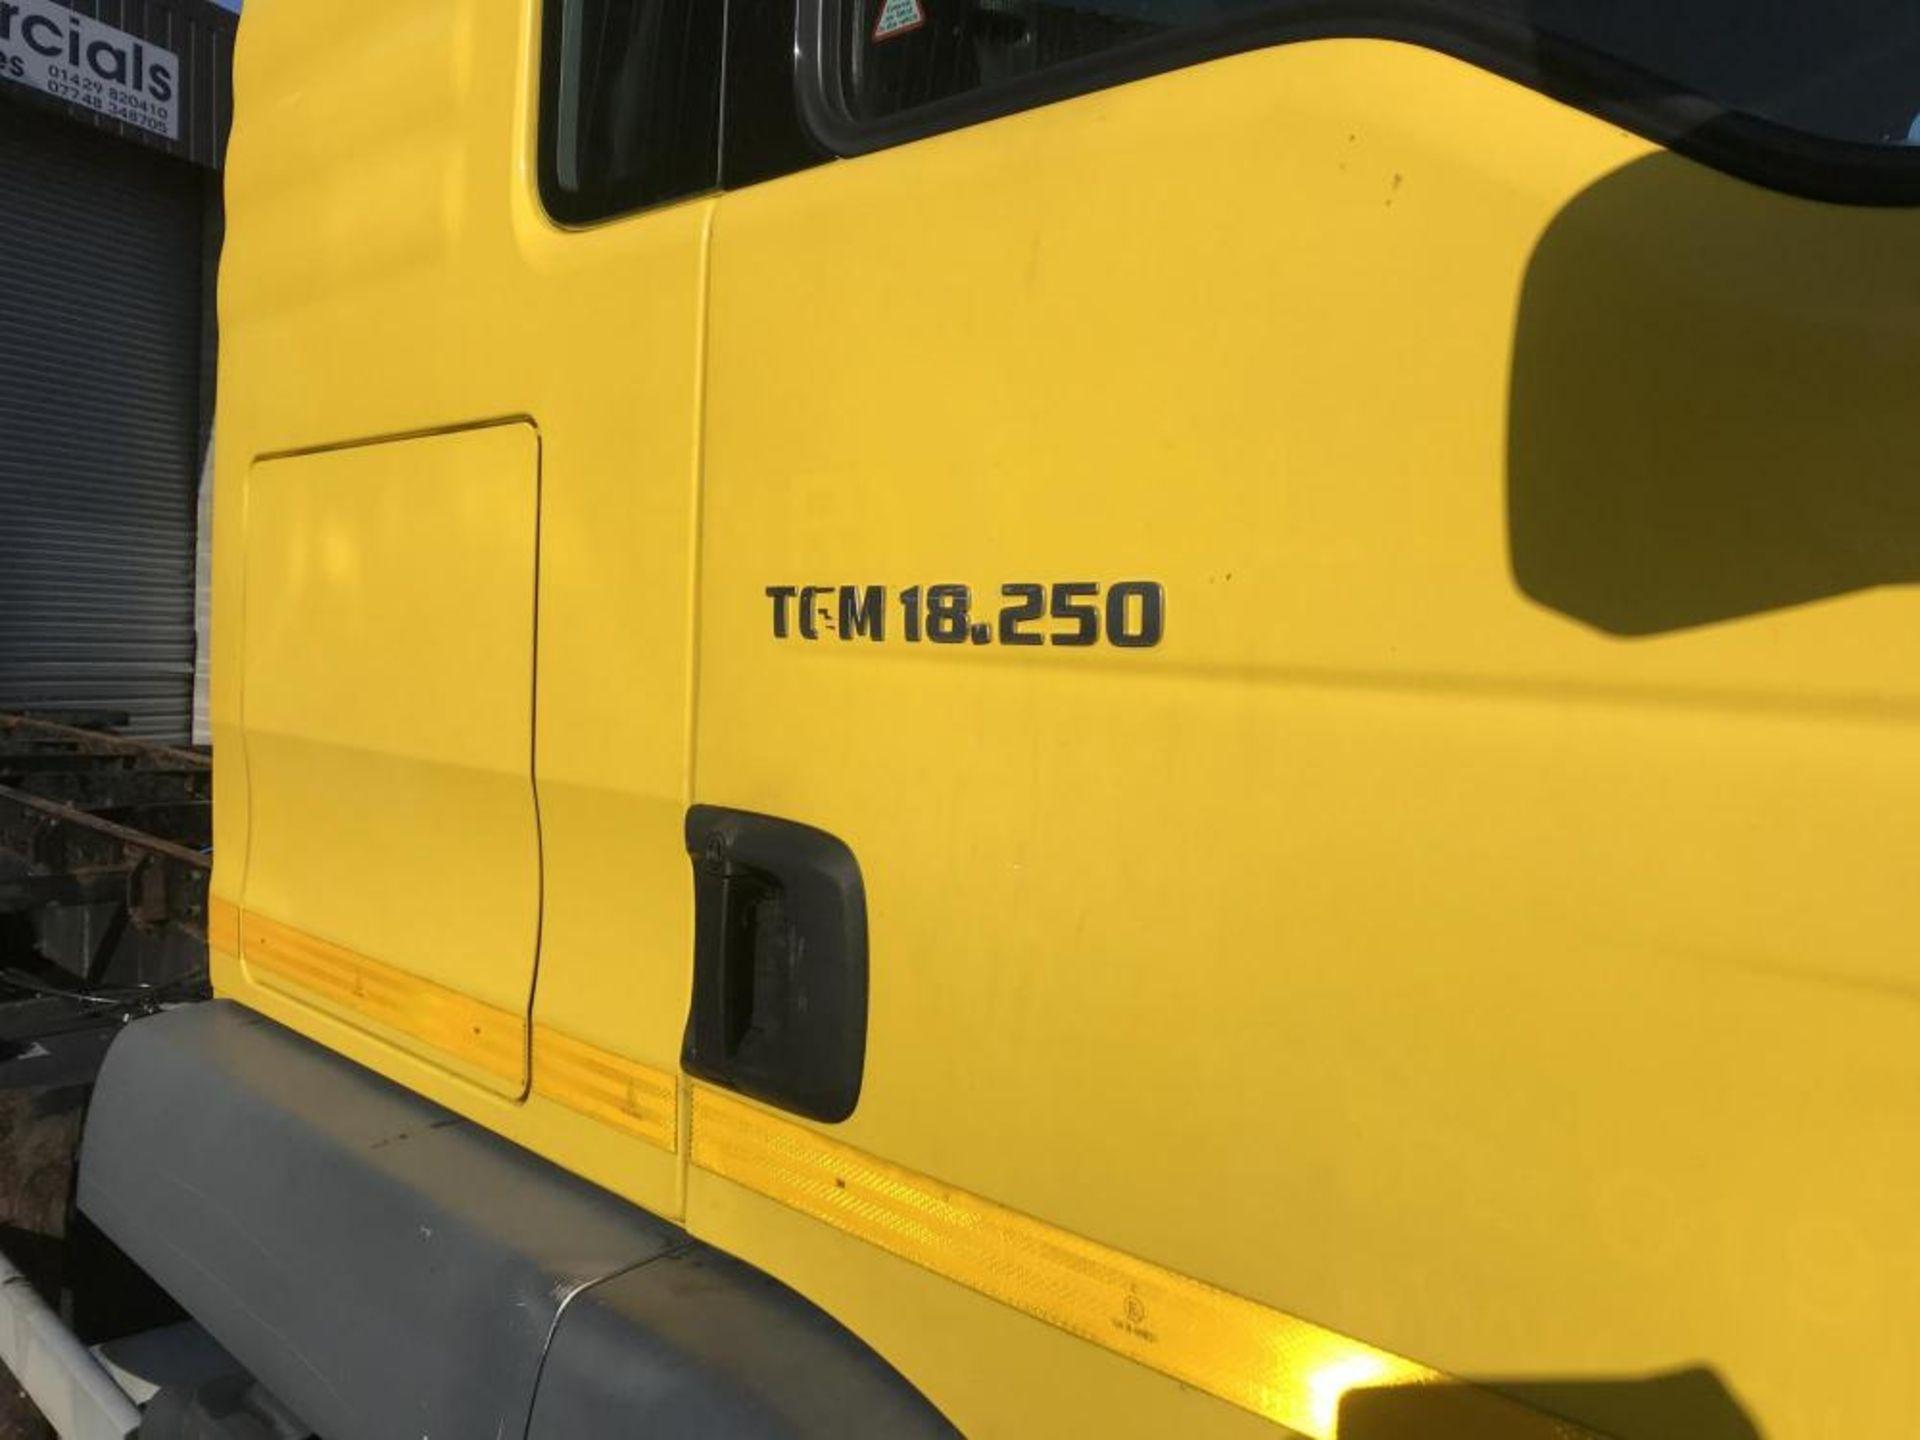 2012/12 REG MAN TG-M 18.250 4X2 LL L 6.9L DIESEL SLEEPER CAB AUTO GEARBOX GOOD CONDITION *PLUS VAT* - Image 4 of 15